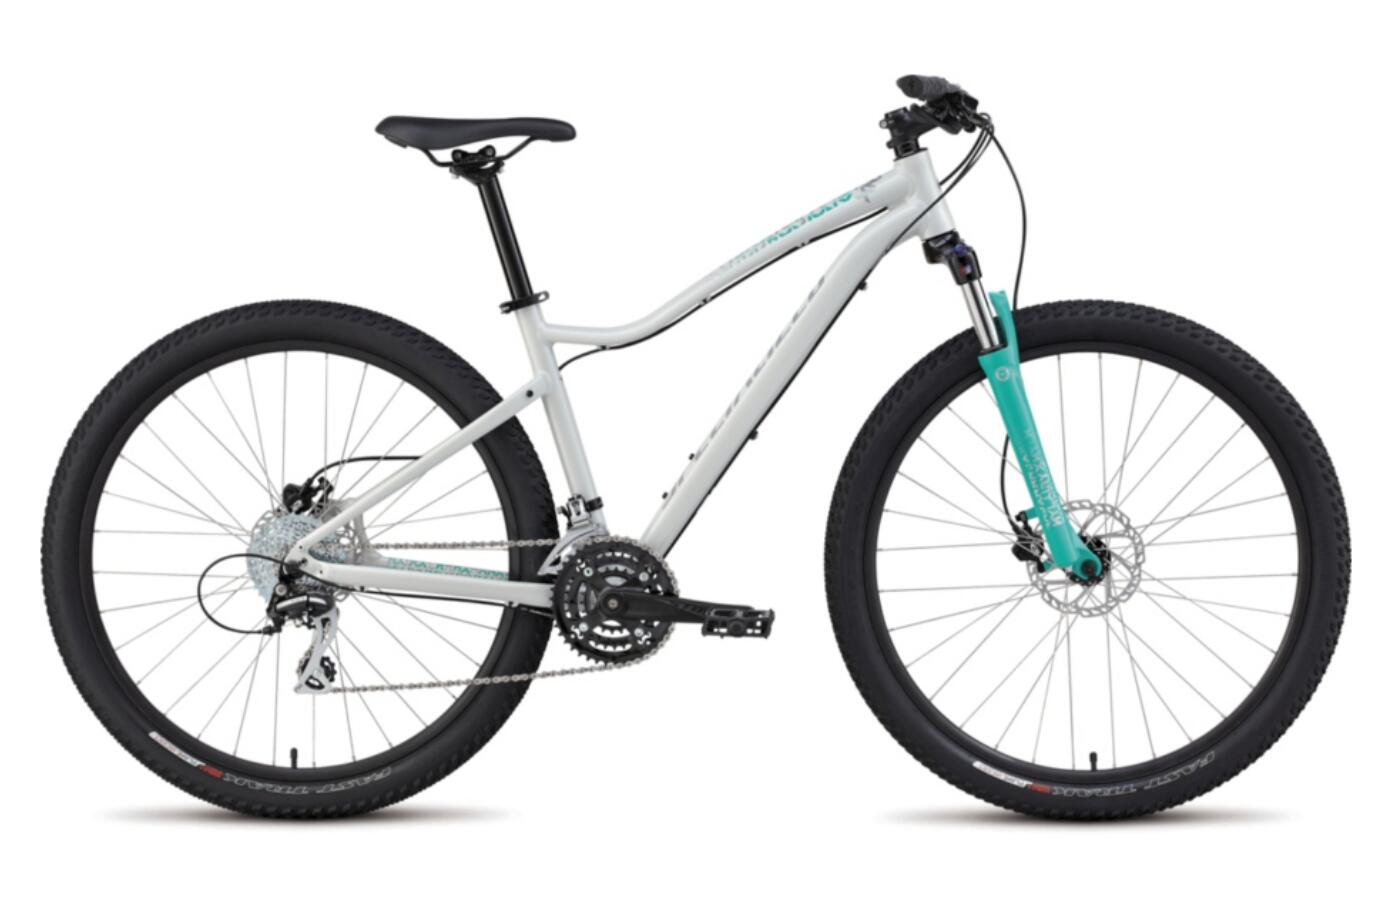 2015 Jynx Sport 650b Alloy Mountain Bike